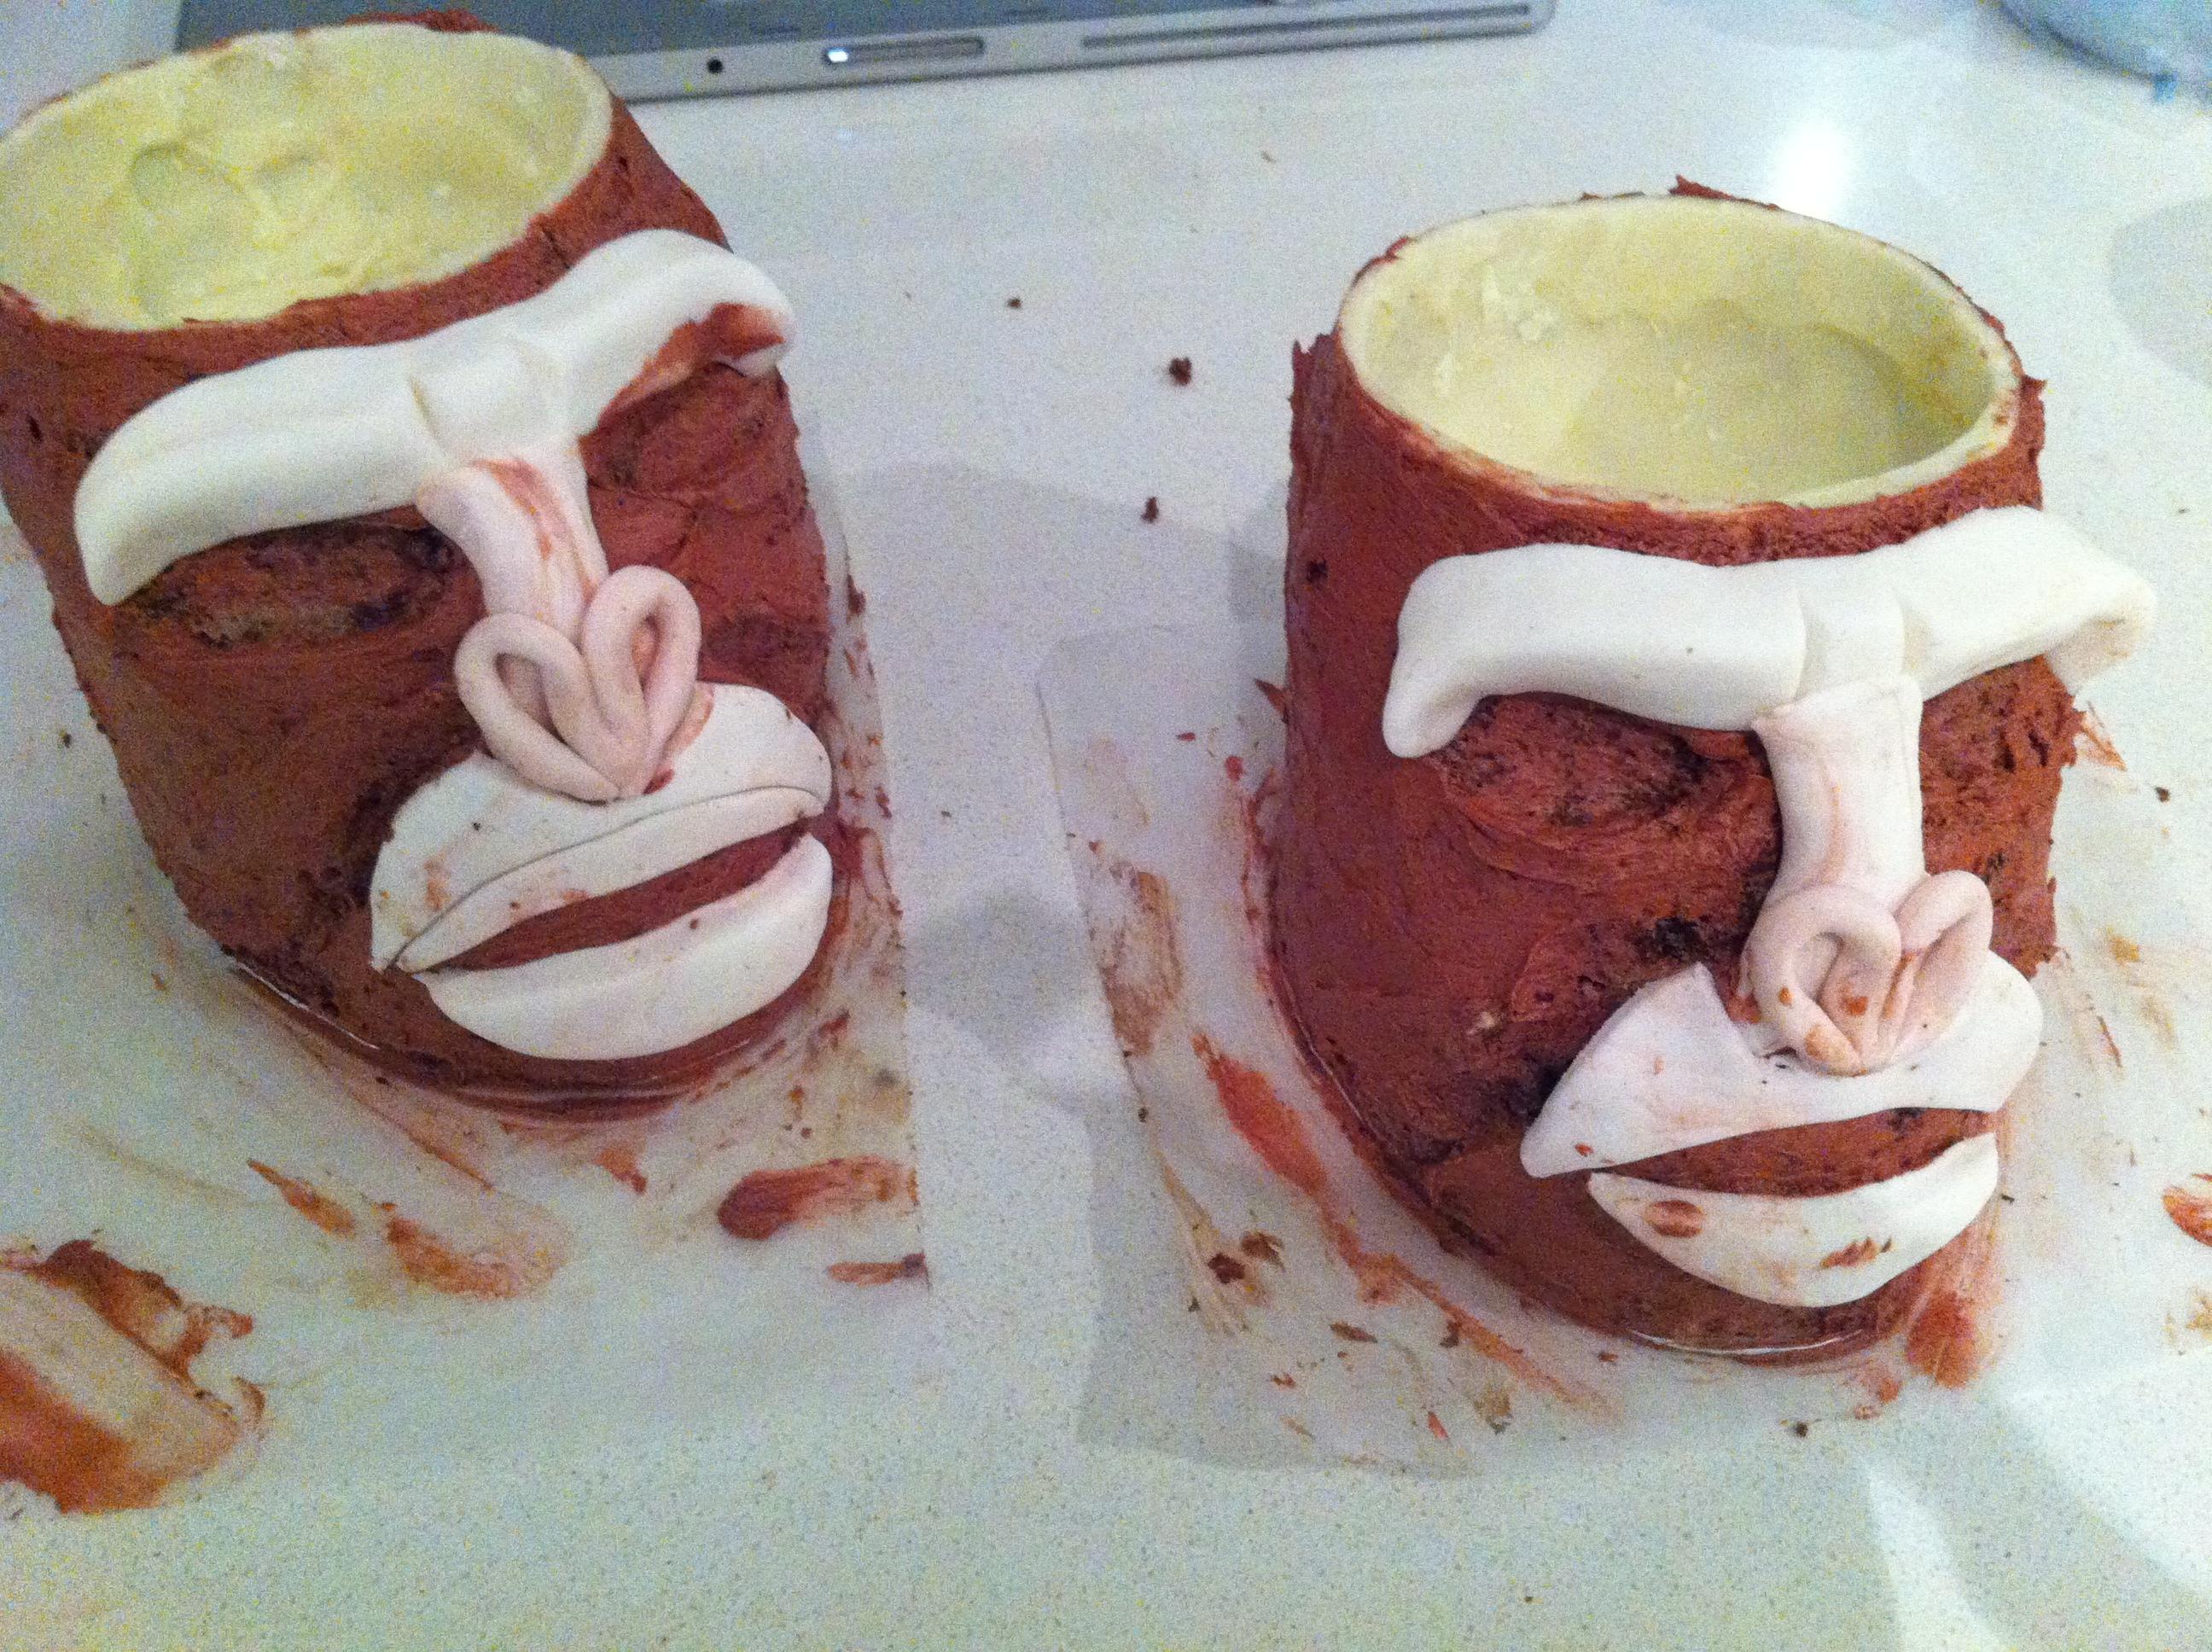 cake artist ann reardon how to cook that